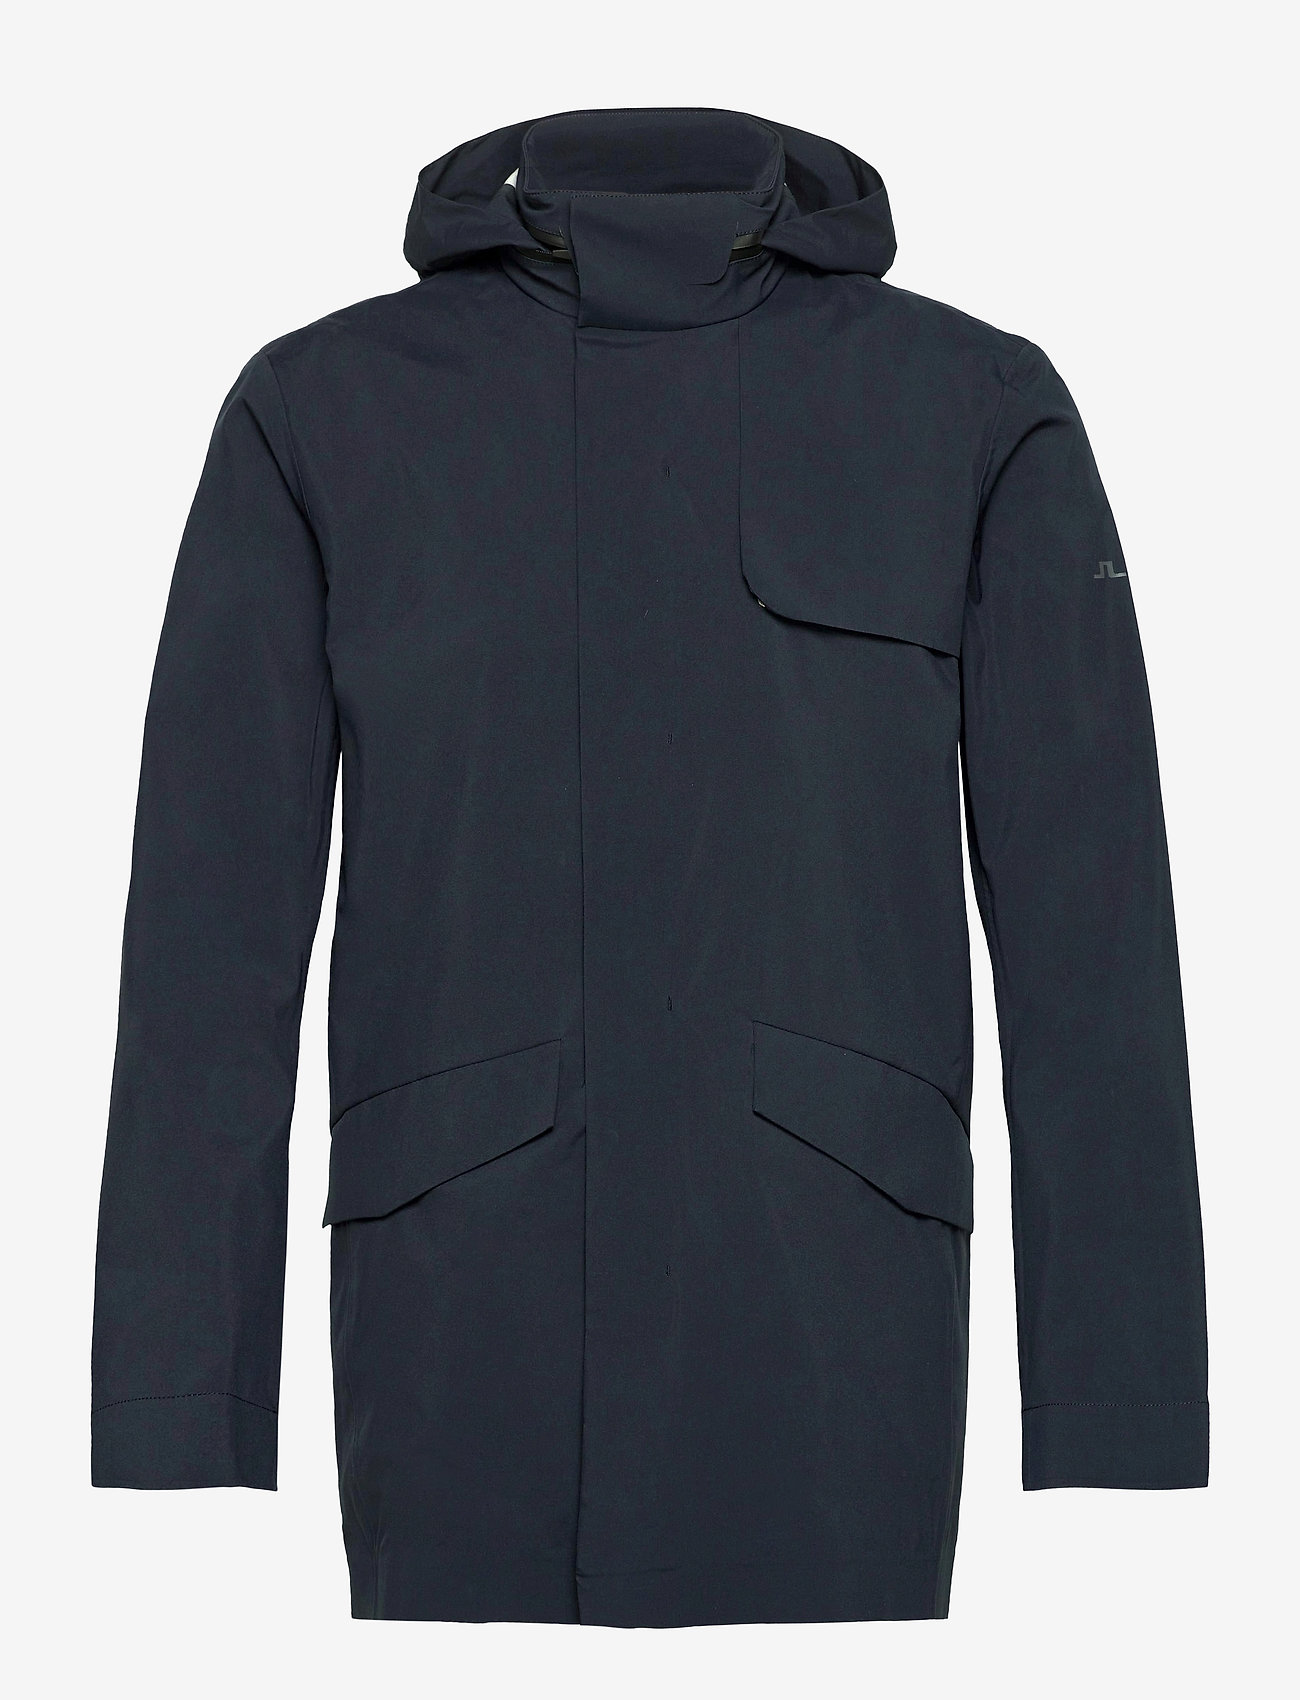 J. Lindeberg - Alph Mech Stretch jacket - leichte jacken - jl navy - 0